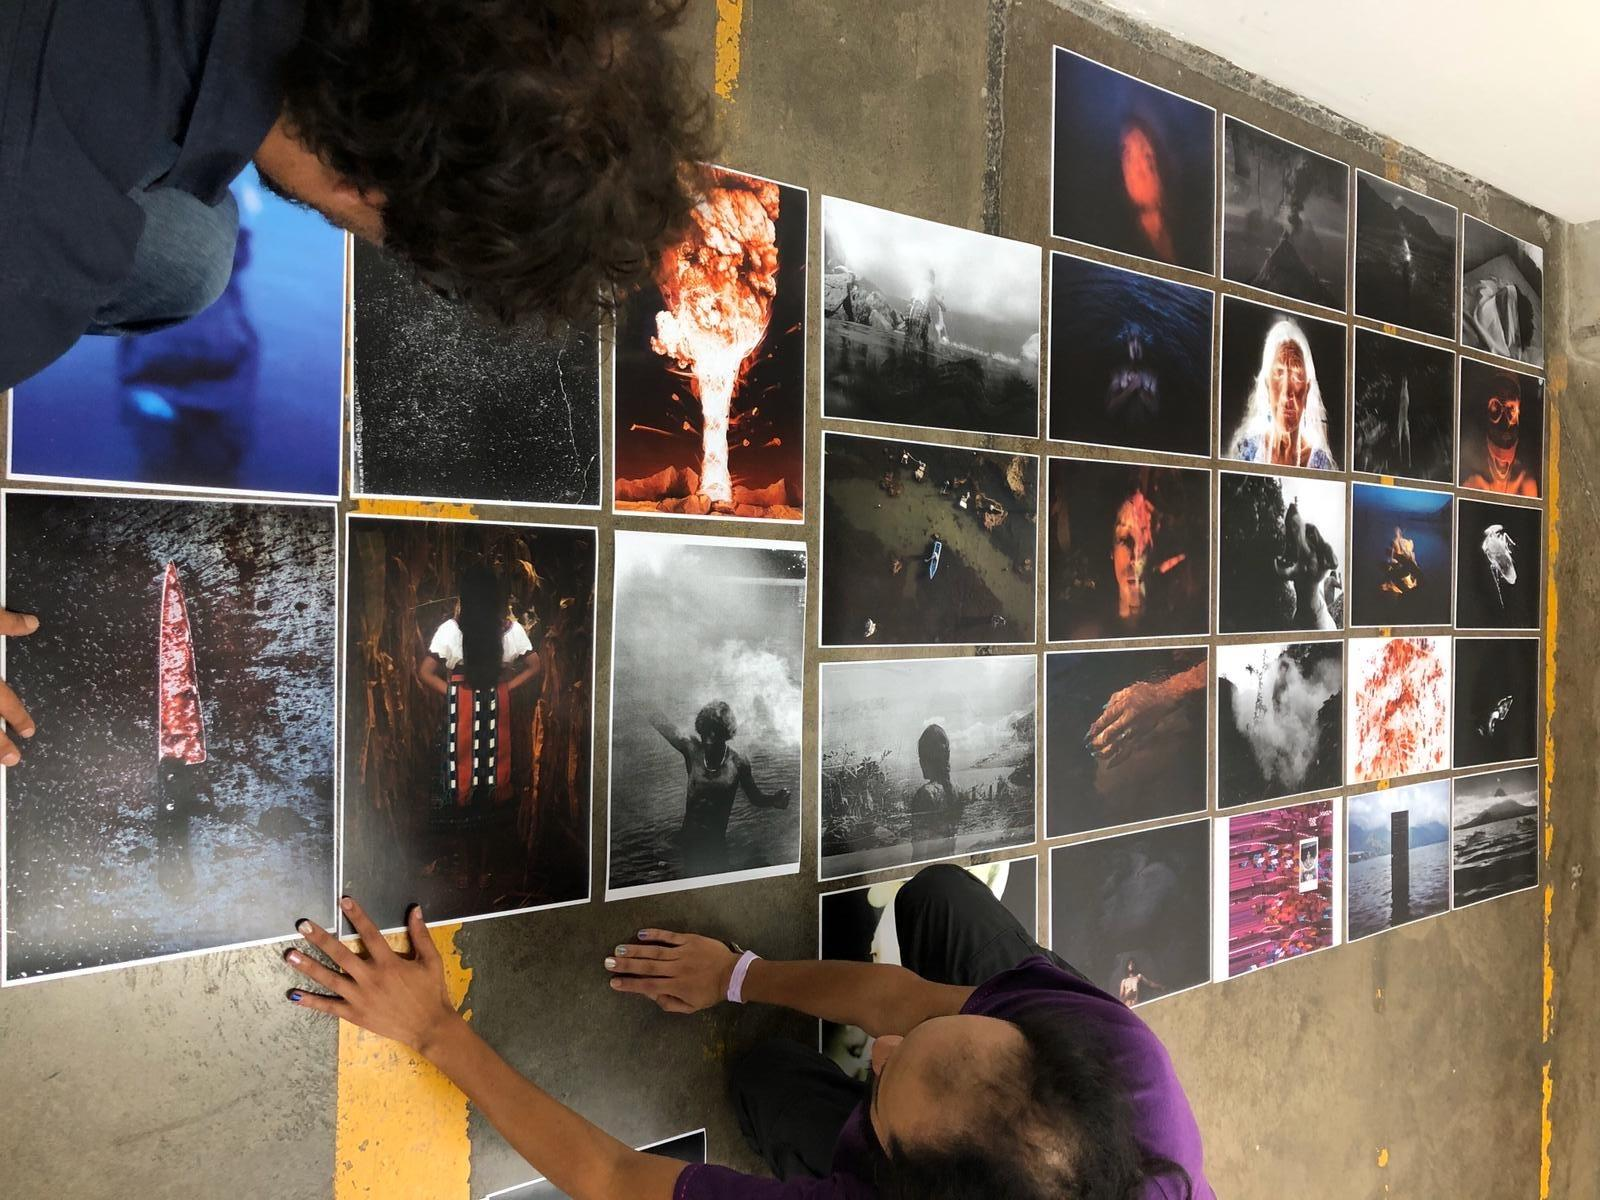 Art and Documentary Photography - Loading 3f0db276-9638-4ac1-a952-9e78737c858e.JPG